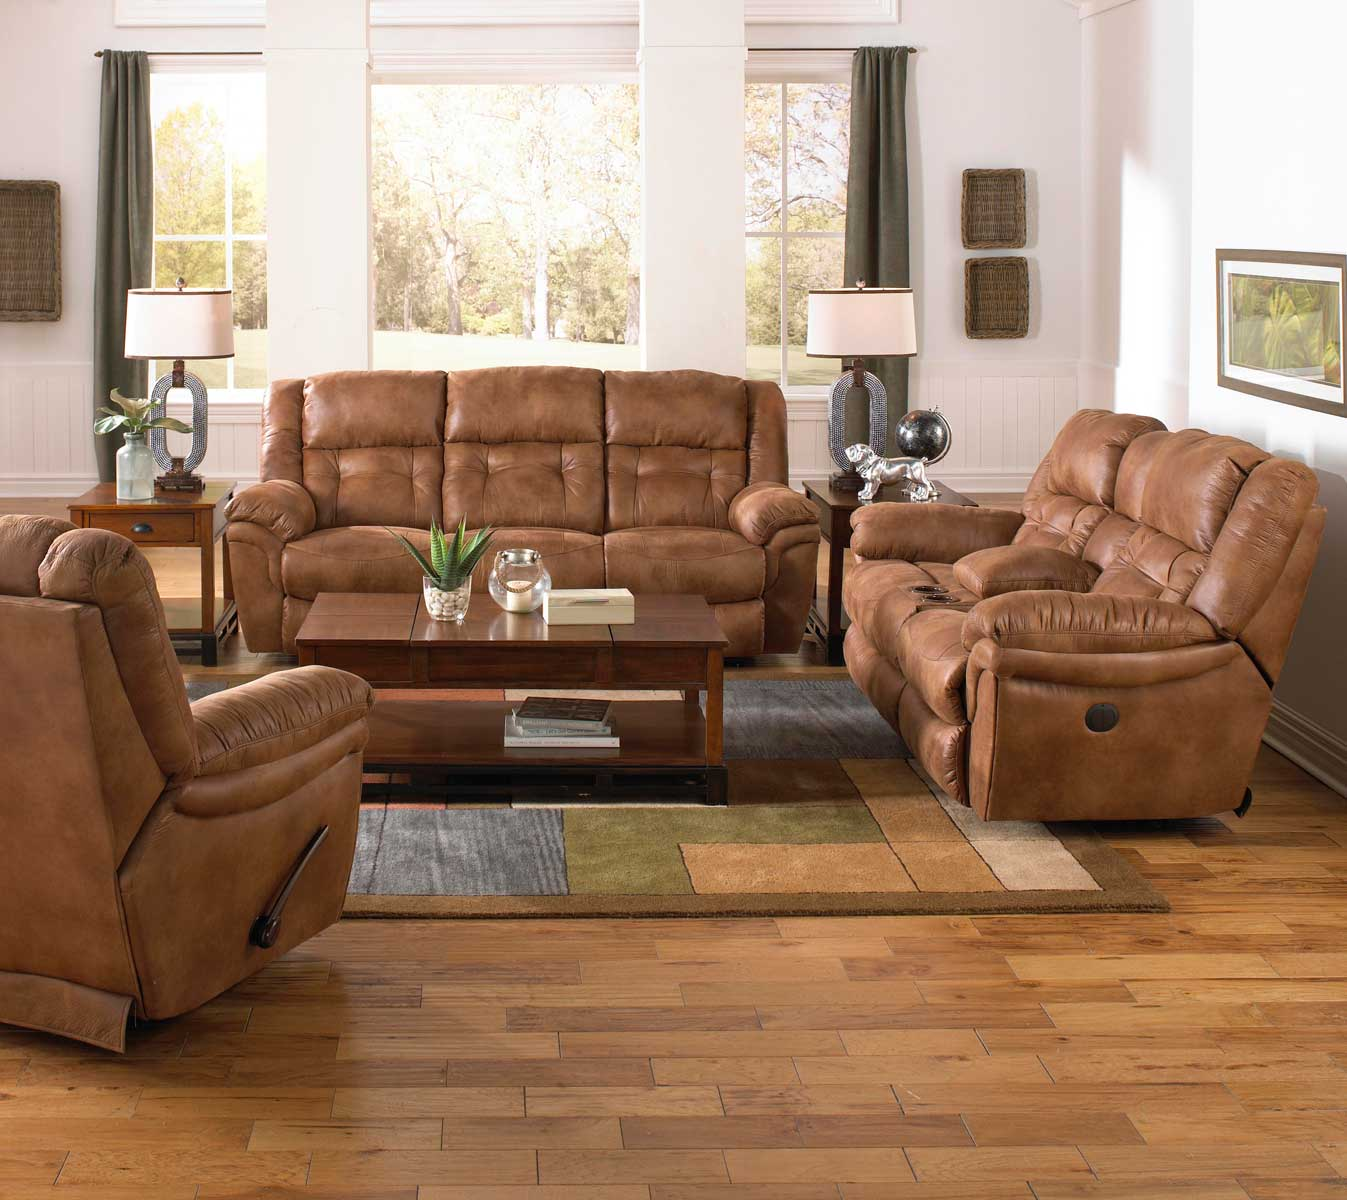 CatNapper Joyner Power Lay Flat Reclining Sofa Set With